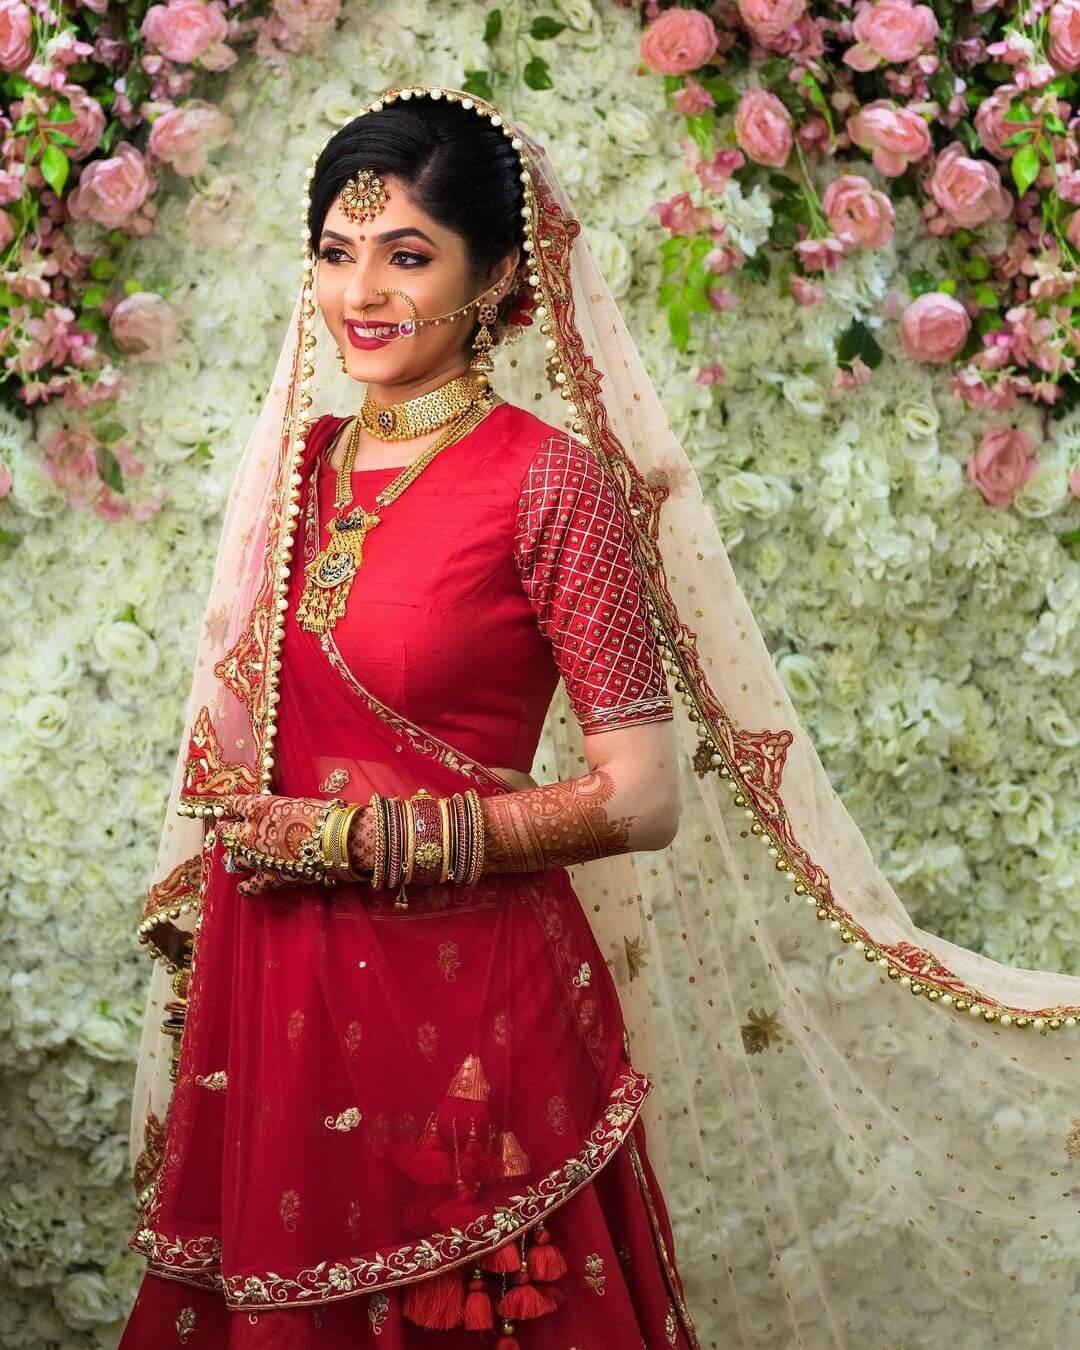 Beauty In Simplicity bridal Look